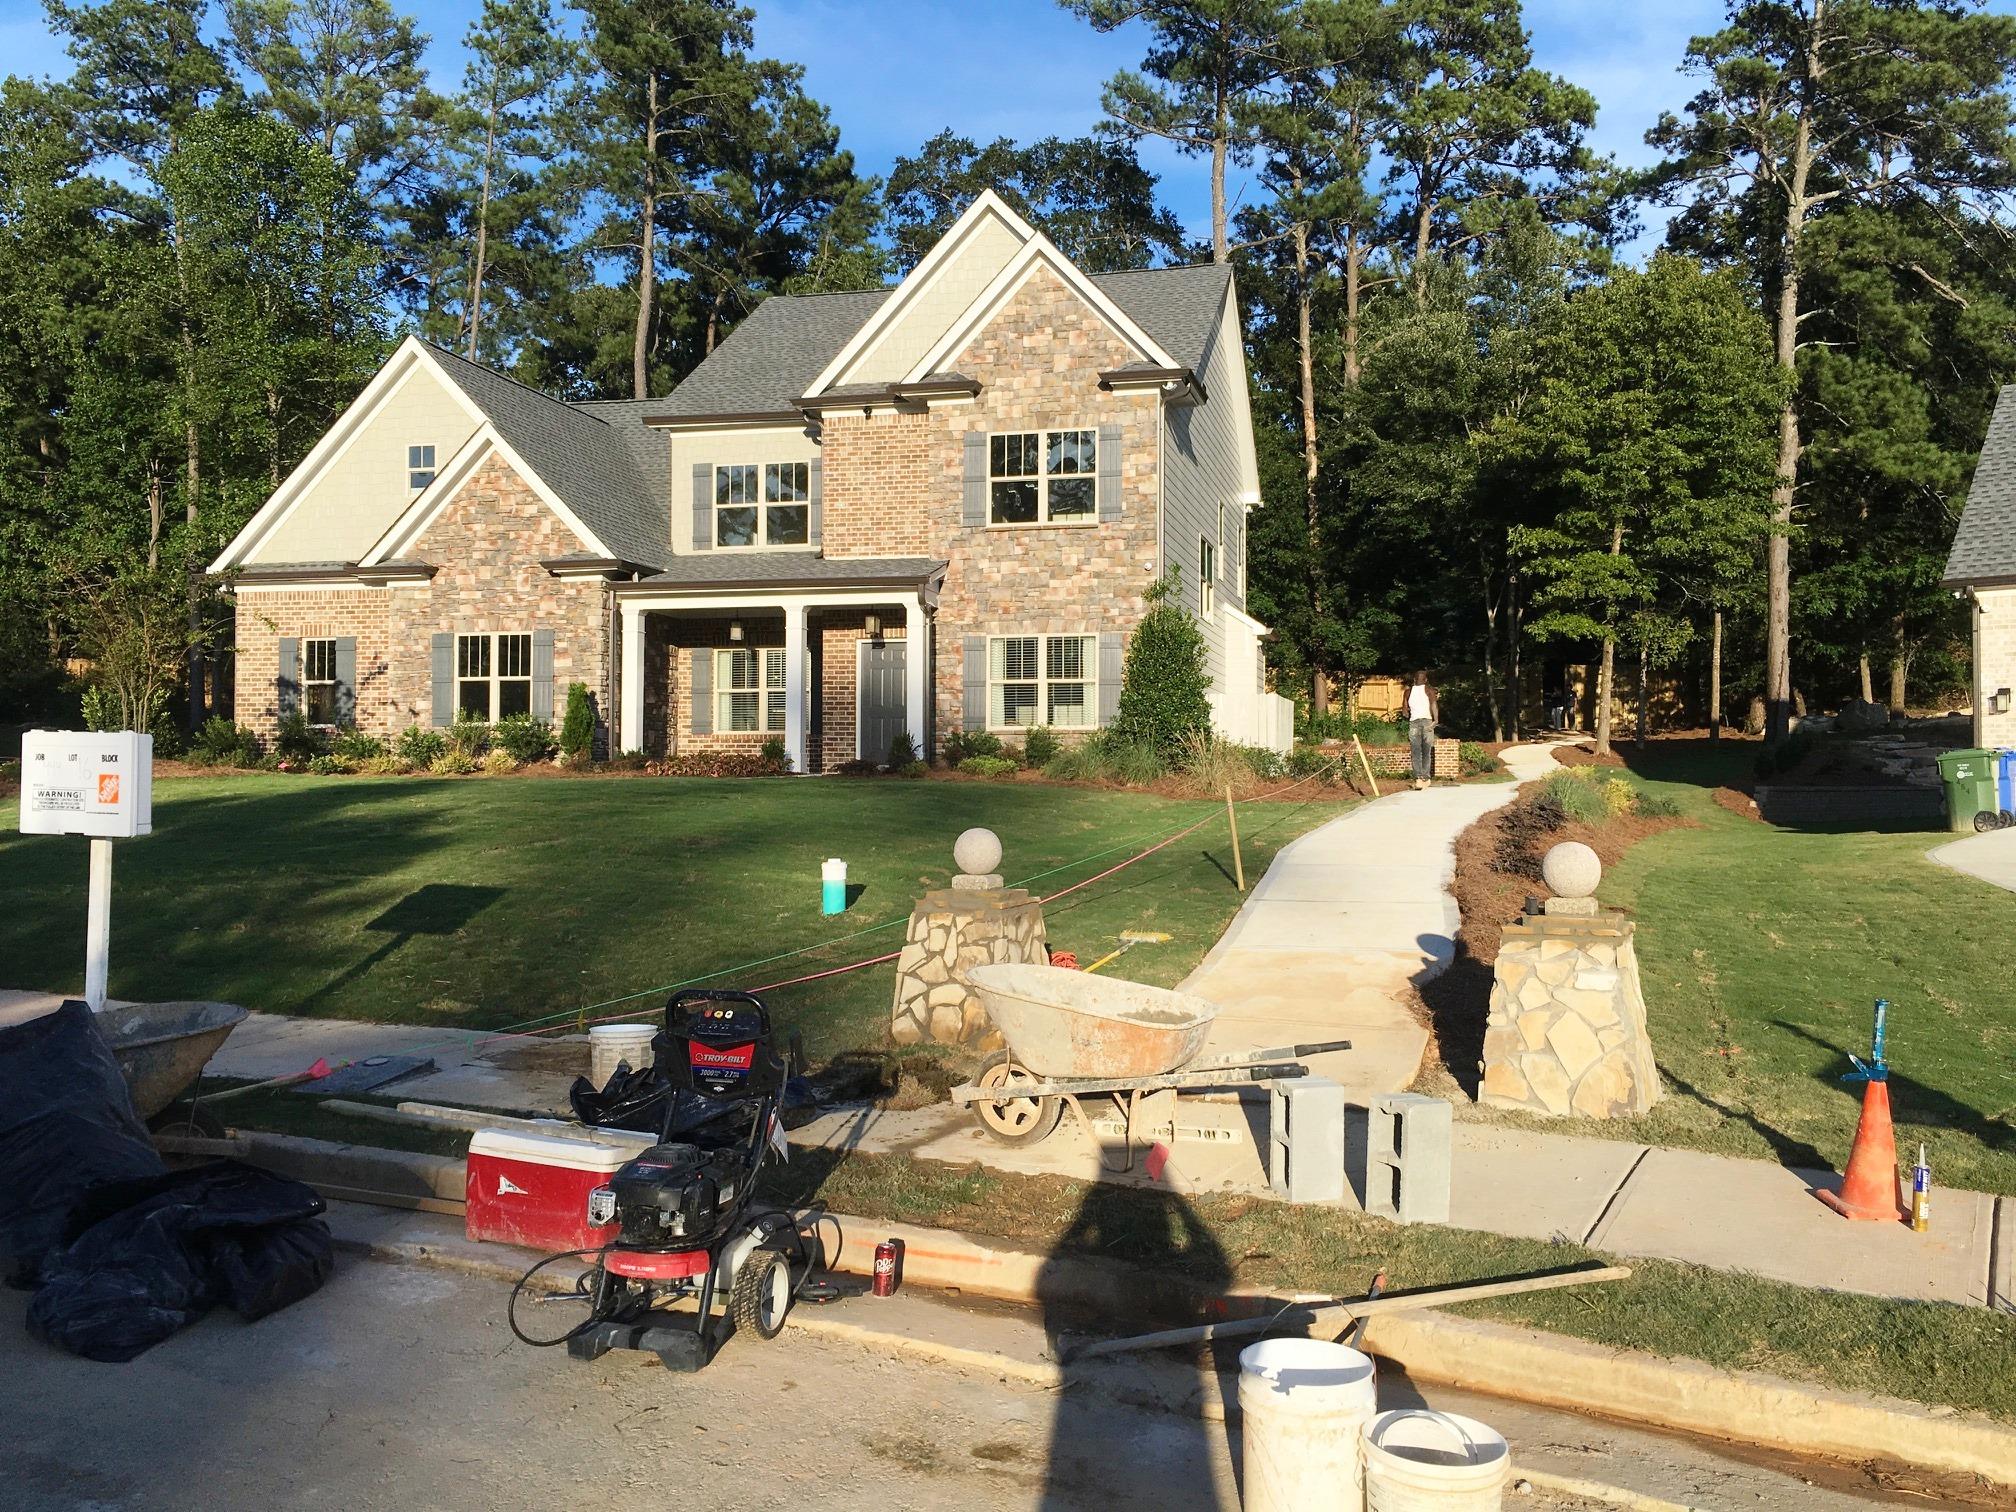 Model Home &Entrance to Atlanta BeltLine (through the Lionel Hampton Trail) -August 18, 2018